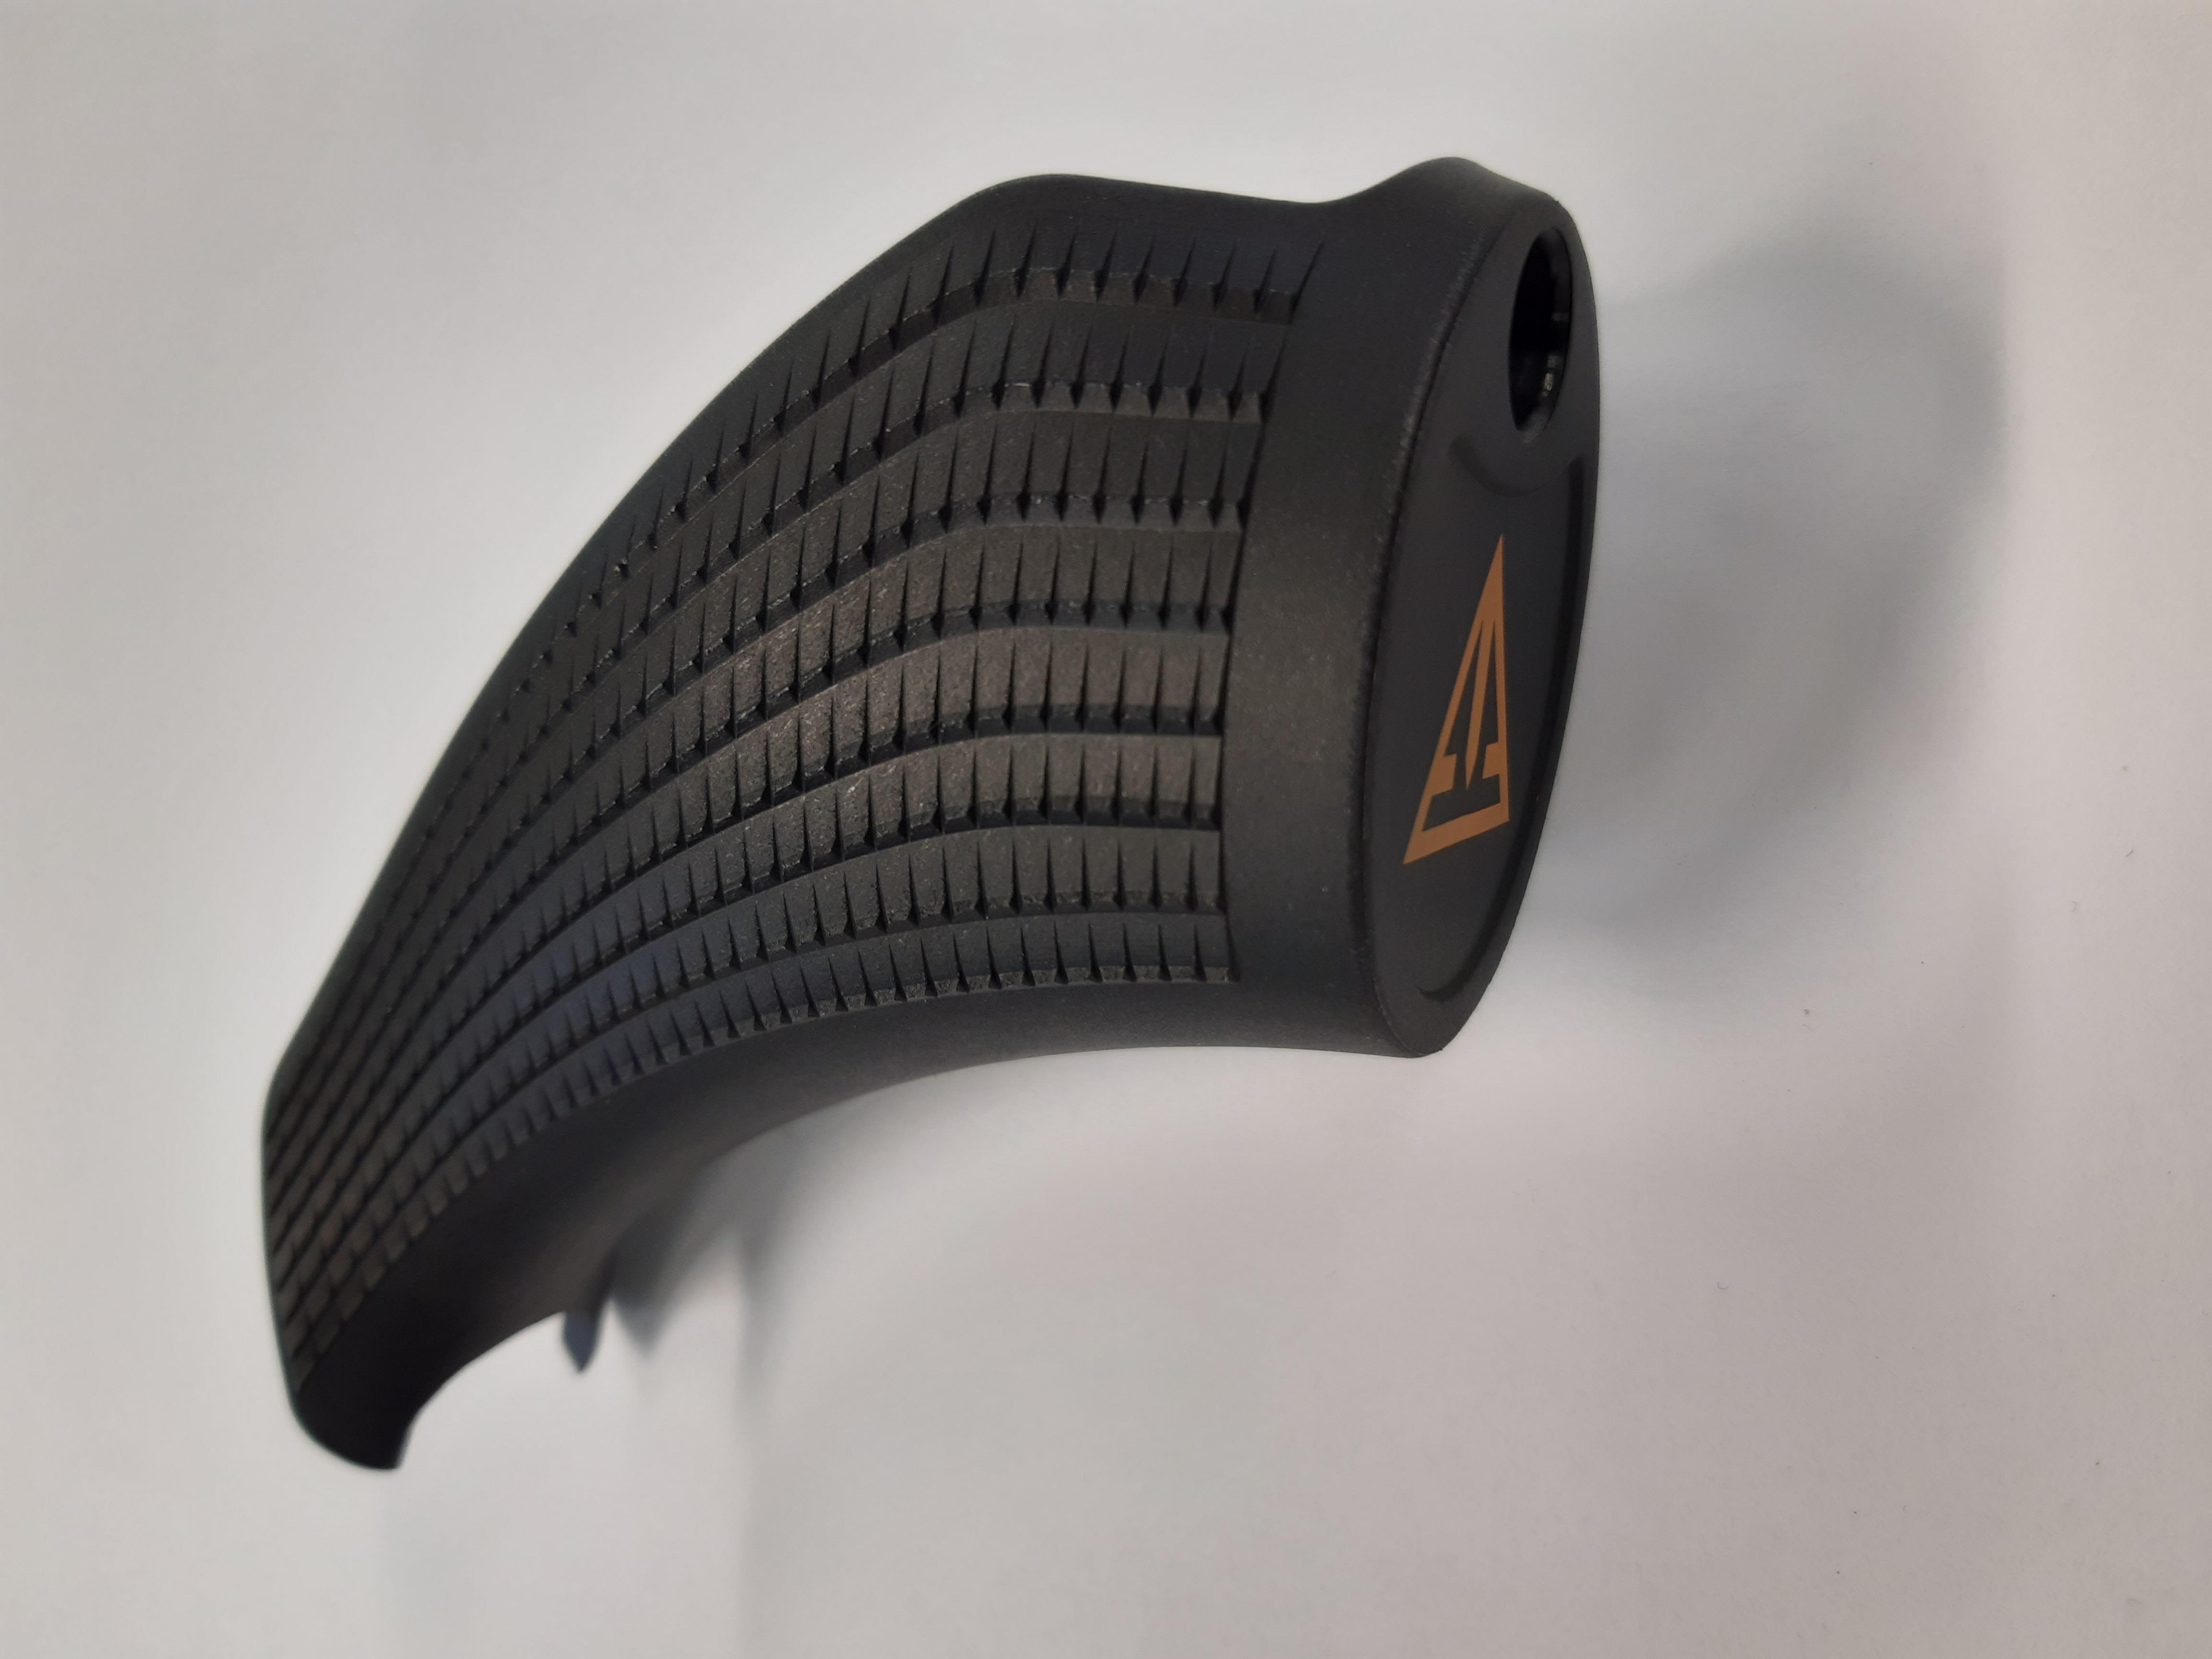 T3x pistoolikahva, vakio black (oranssi logo)